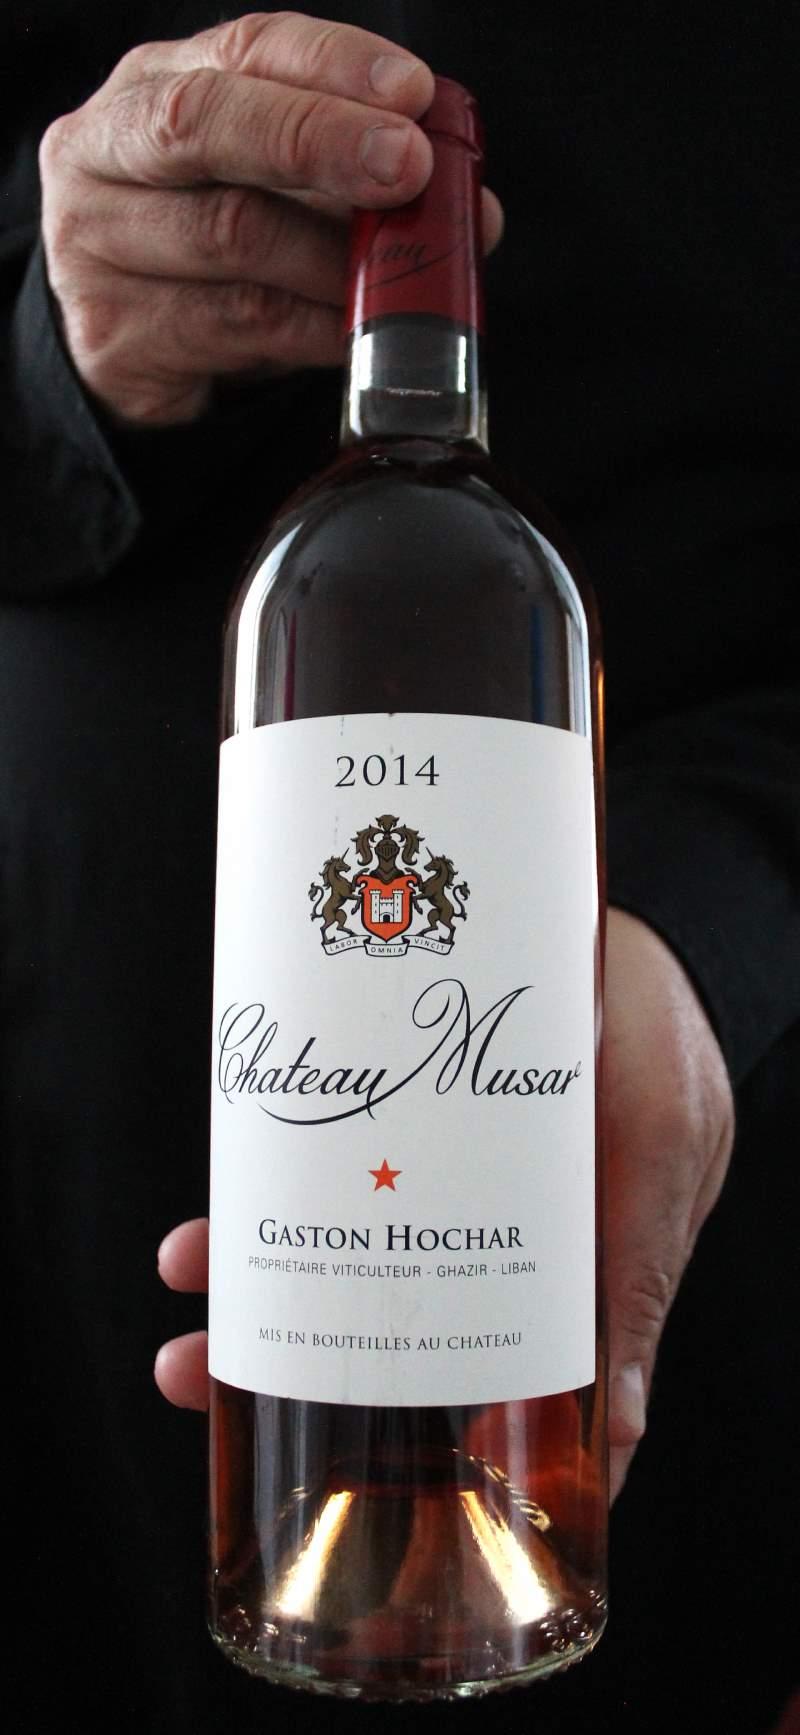 Rosée-viini Chateau Musar Rose 2014 äitienpäivänä. Viinihetki.